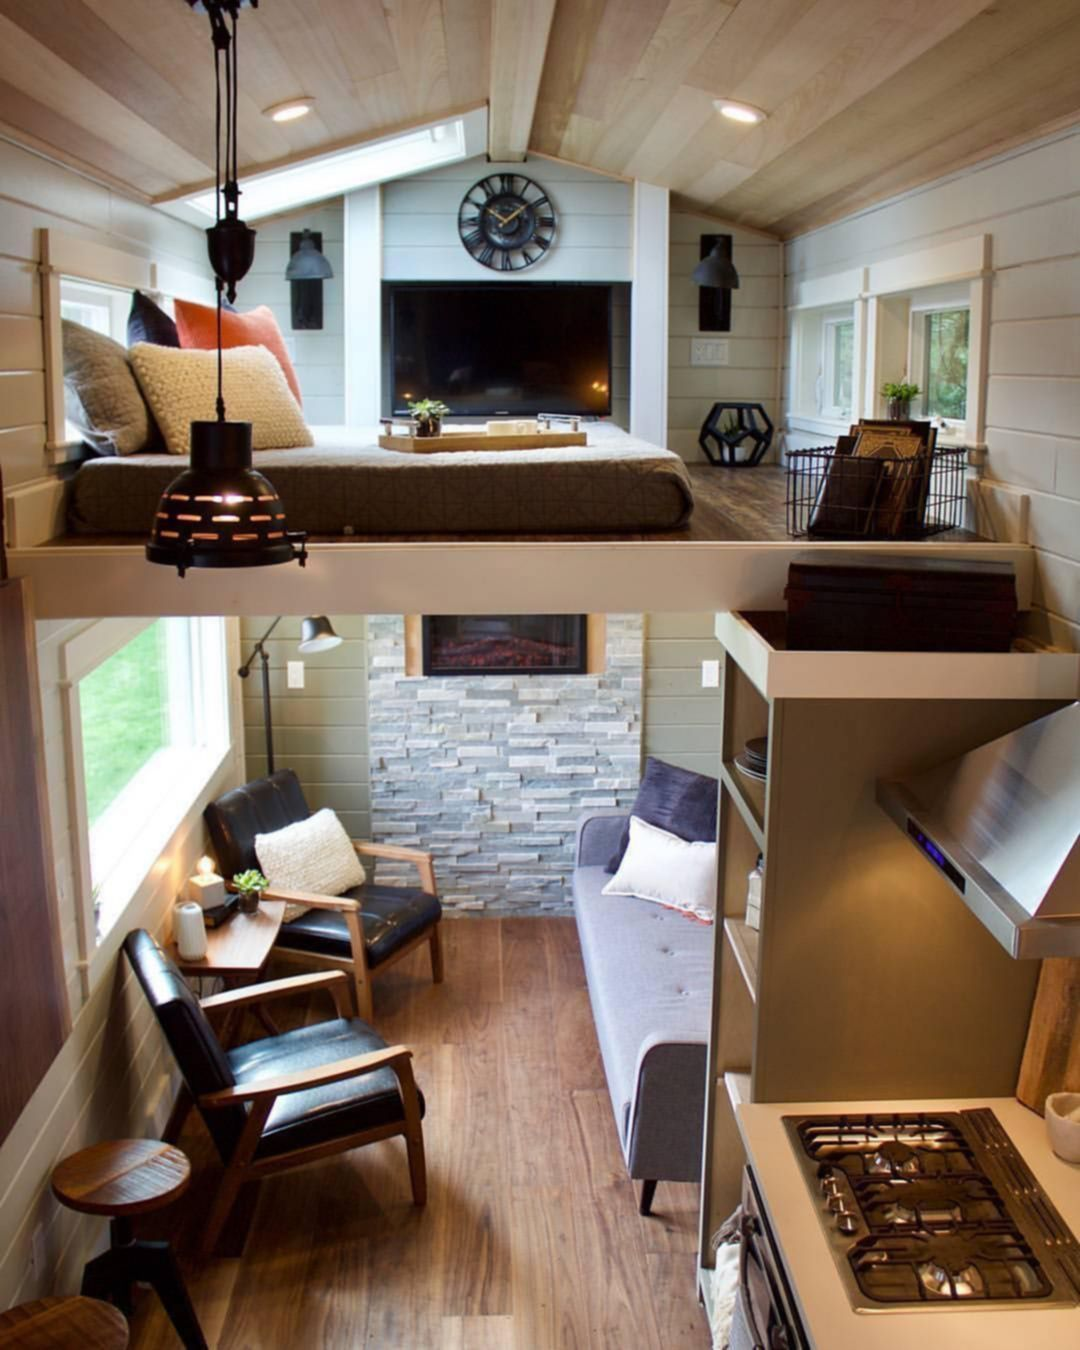 30 Simple Tiny House Interior Ideas For Inspiration Tiny House Interior Design Tiny House Living Room Tiny House Interior